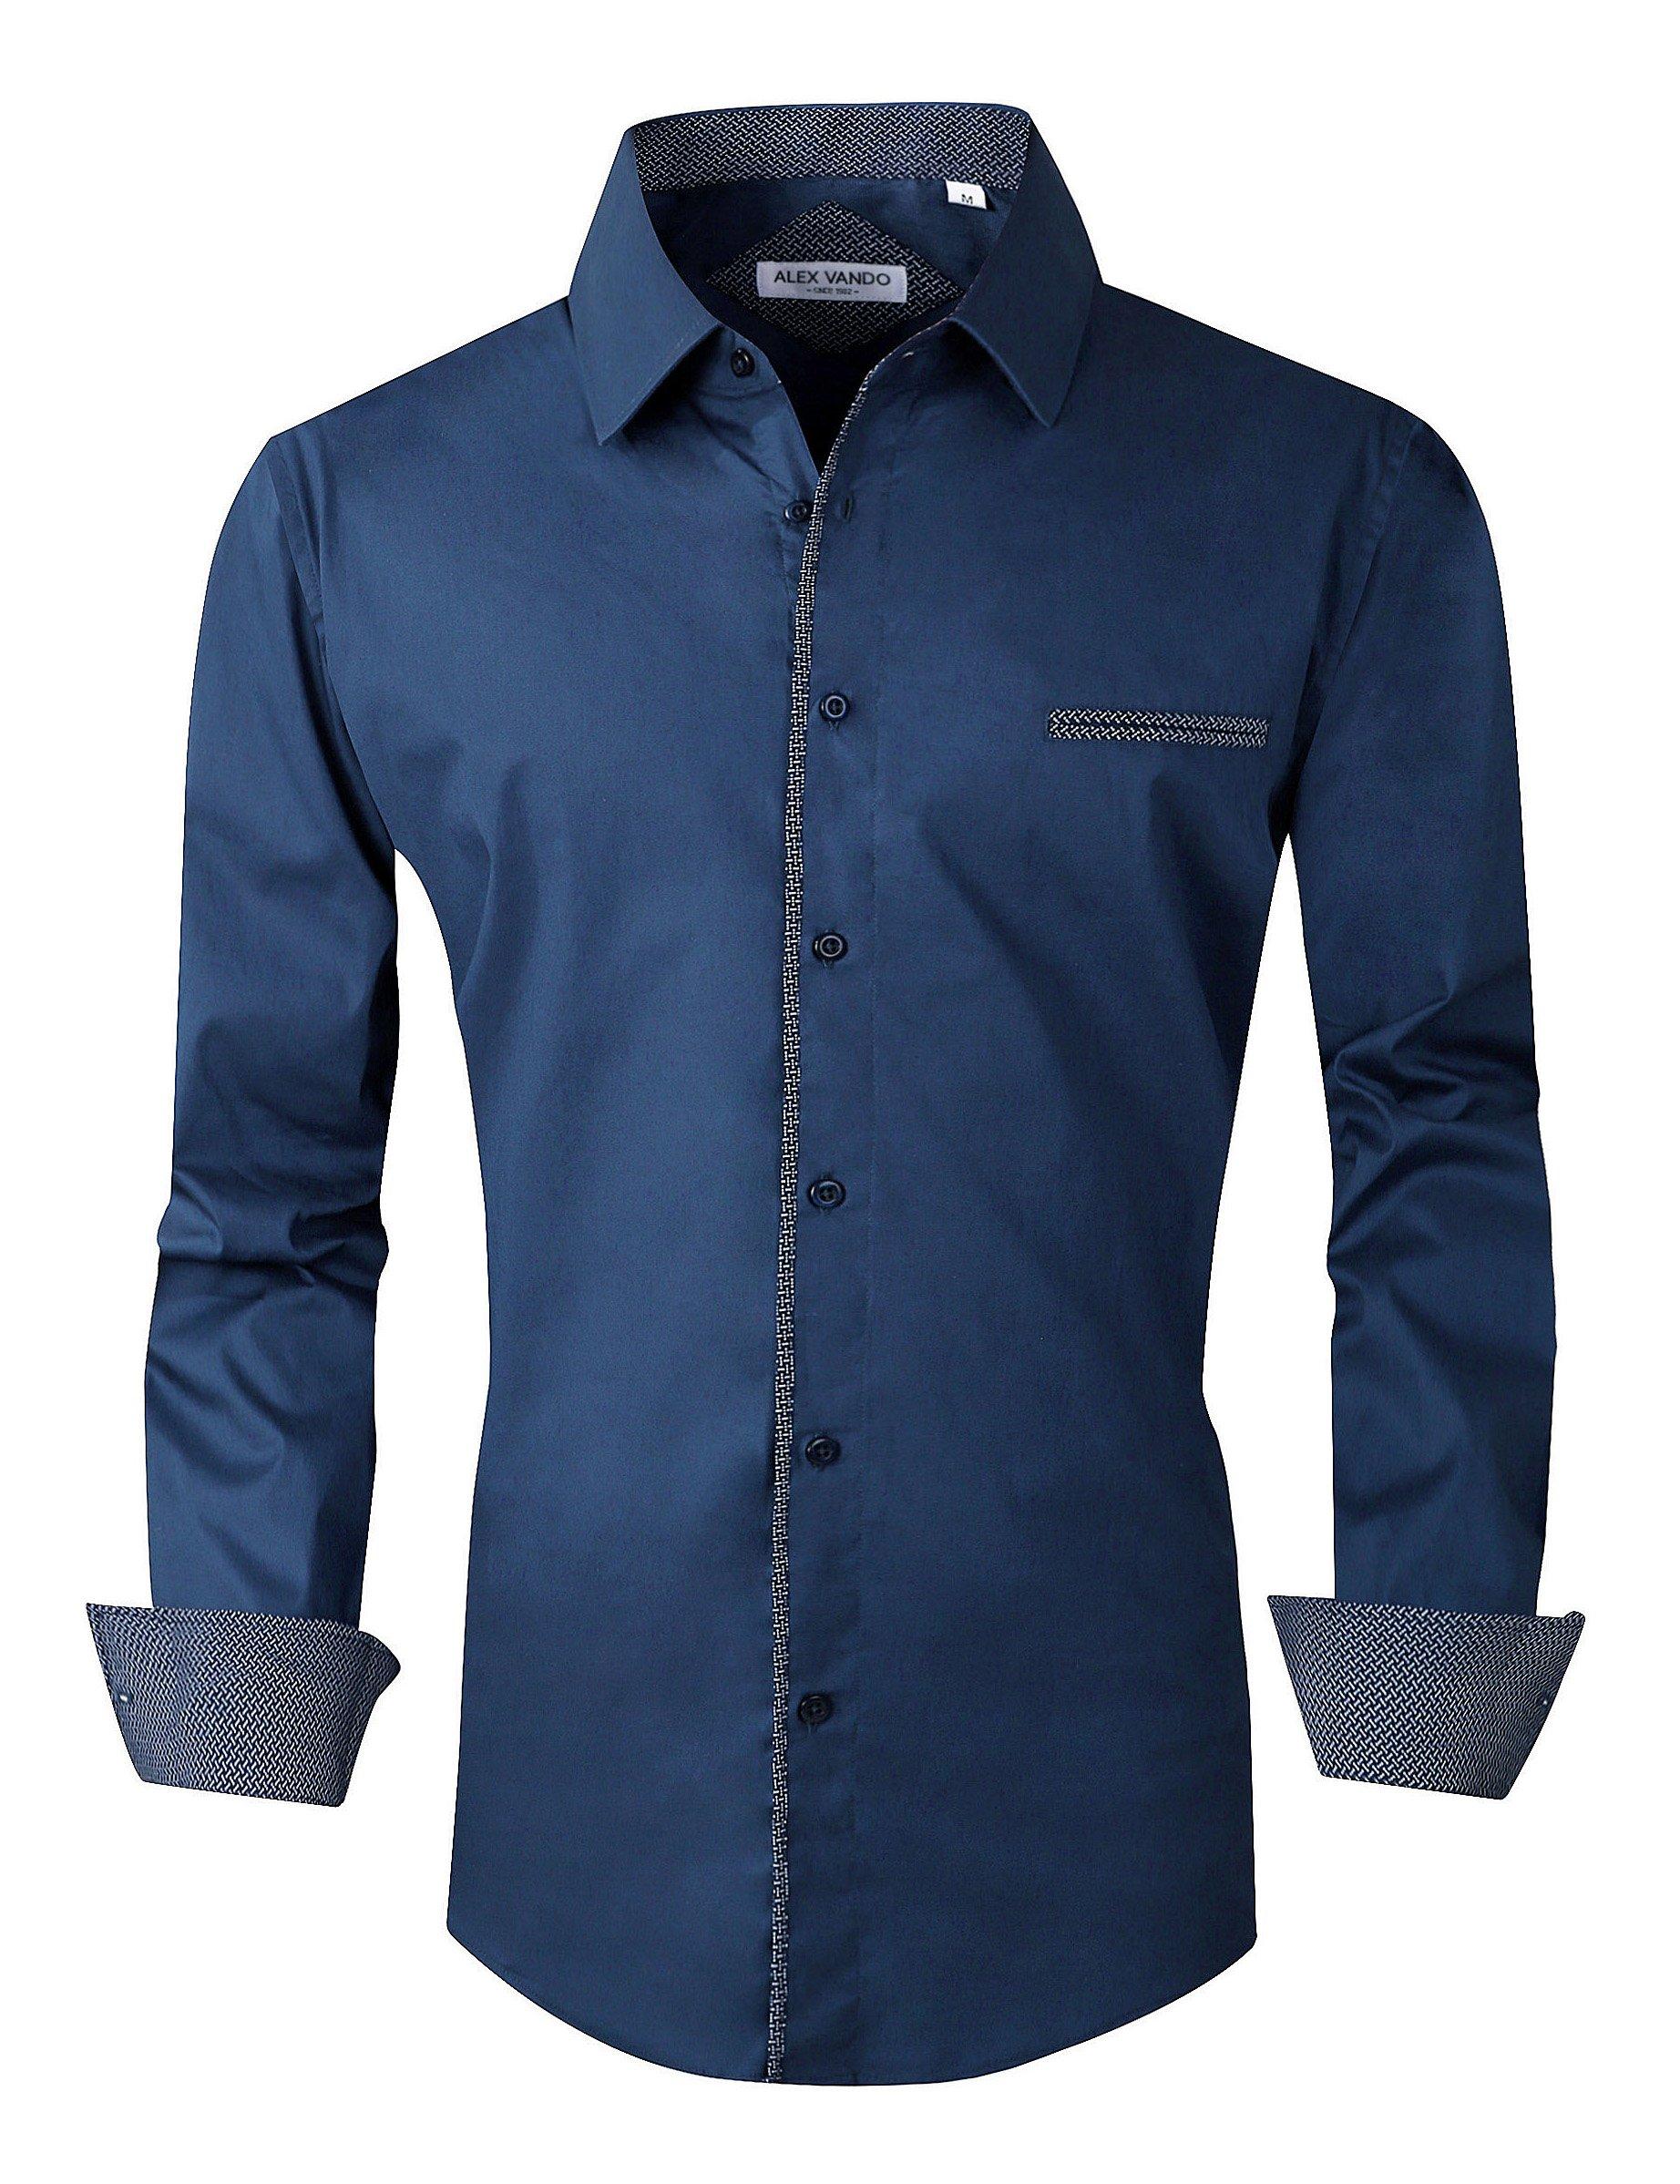 Joey CV Mens Casual Button Down Shirts Long Sleeve Regular Fit(Navy,XXLarge)